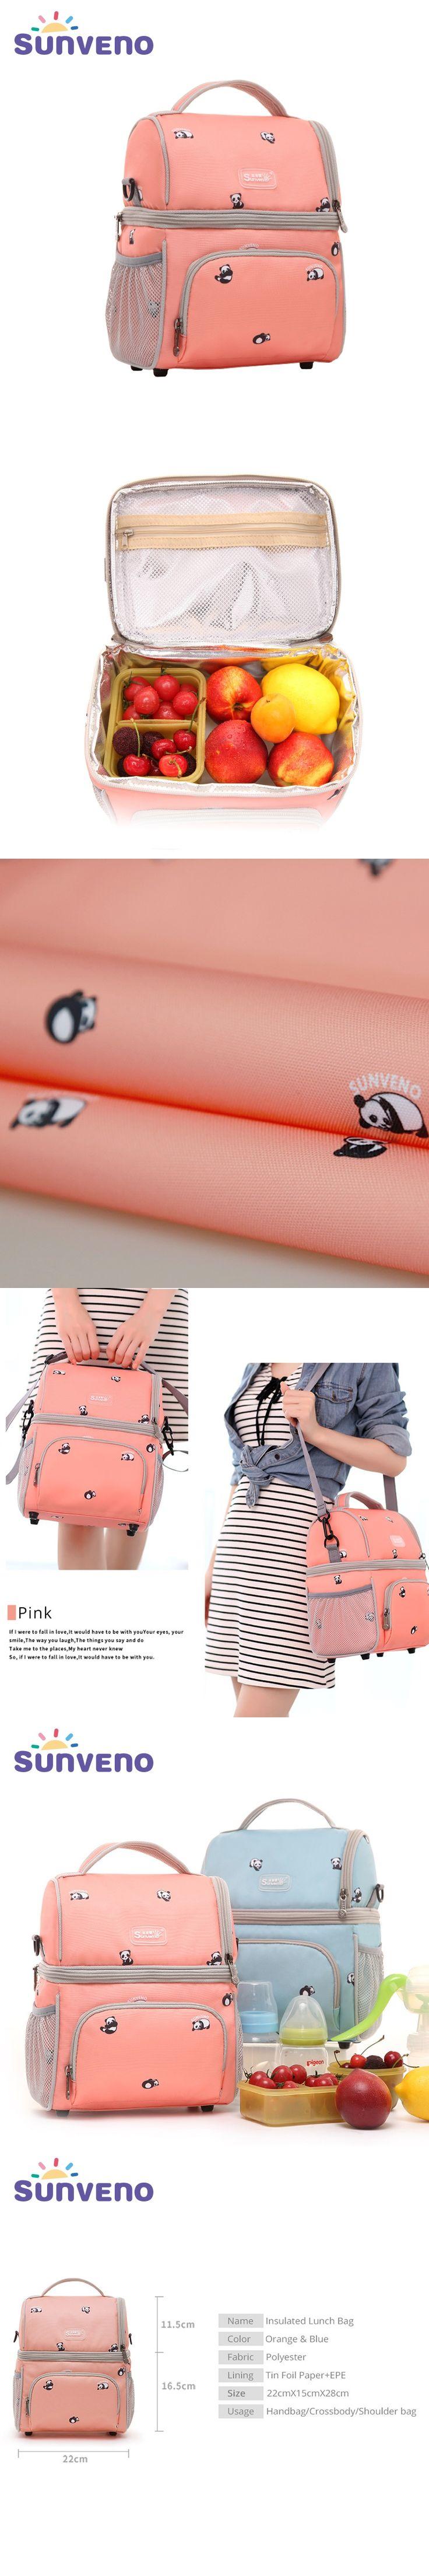 SUNVENO New Fashion Bottle Bag Keep Fresh Insulation Bag Skip Zoo Panda Pattern Thermal Bag for Bottles Baby Bottle Holder